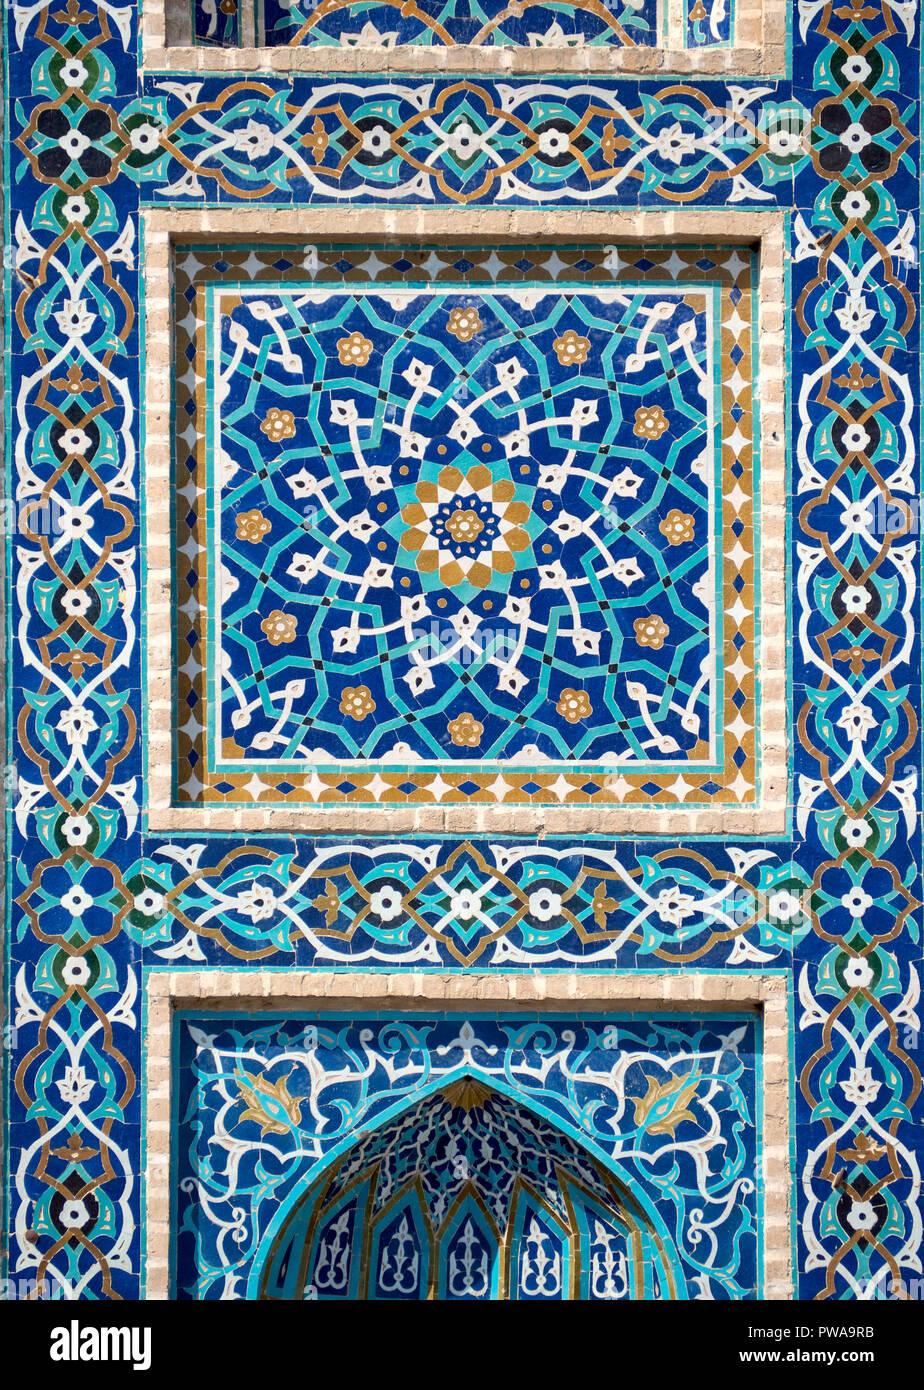 Detail of tilework in Jameh mosque, Yazd, Iran. - Stock Image